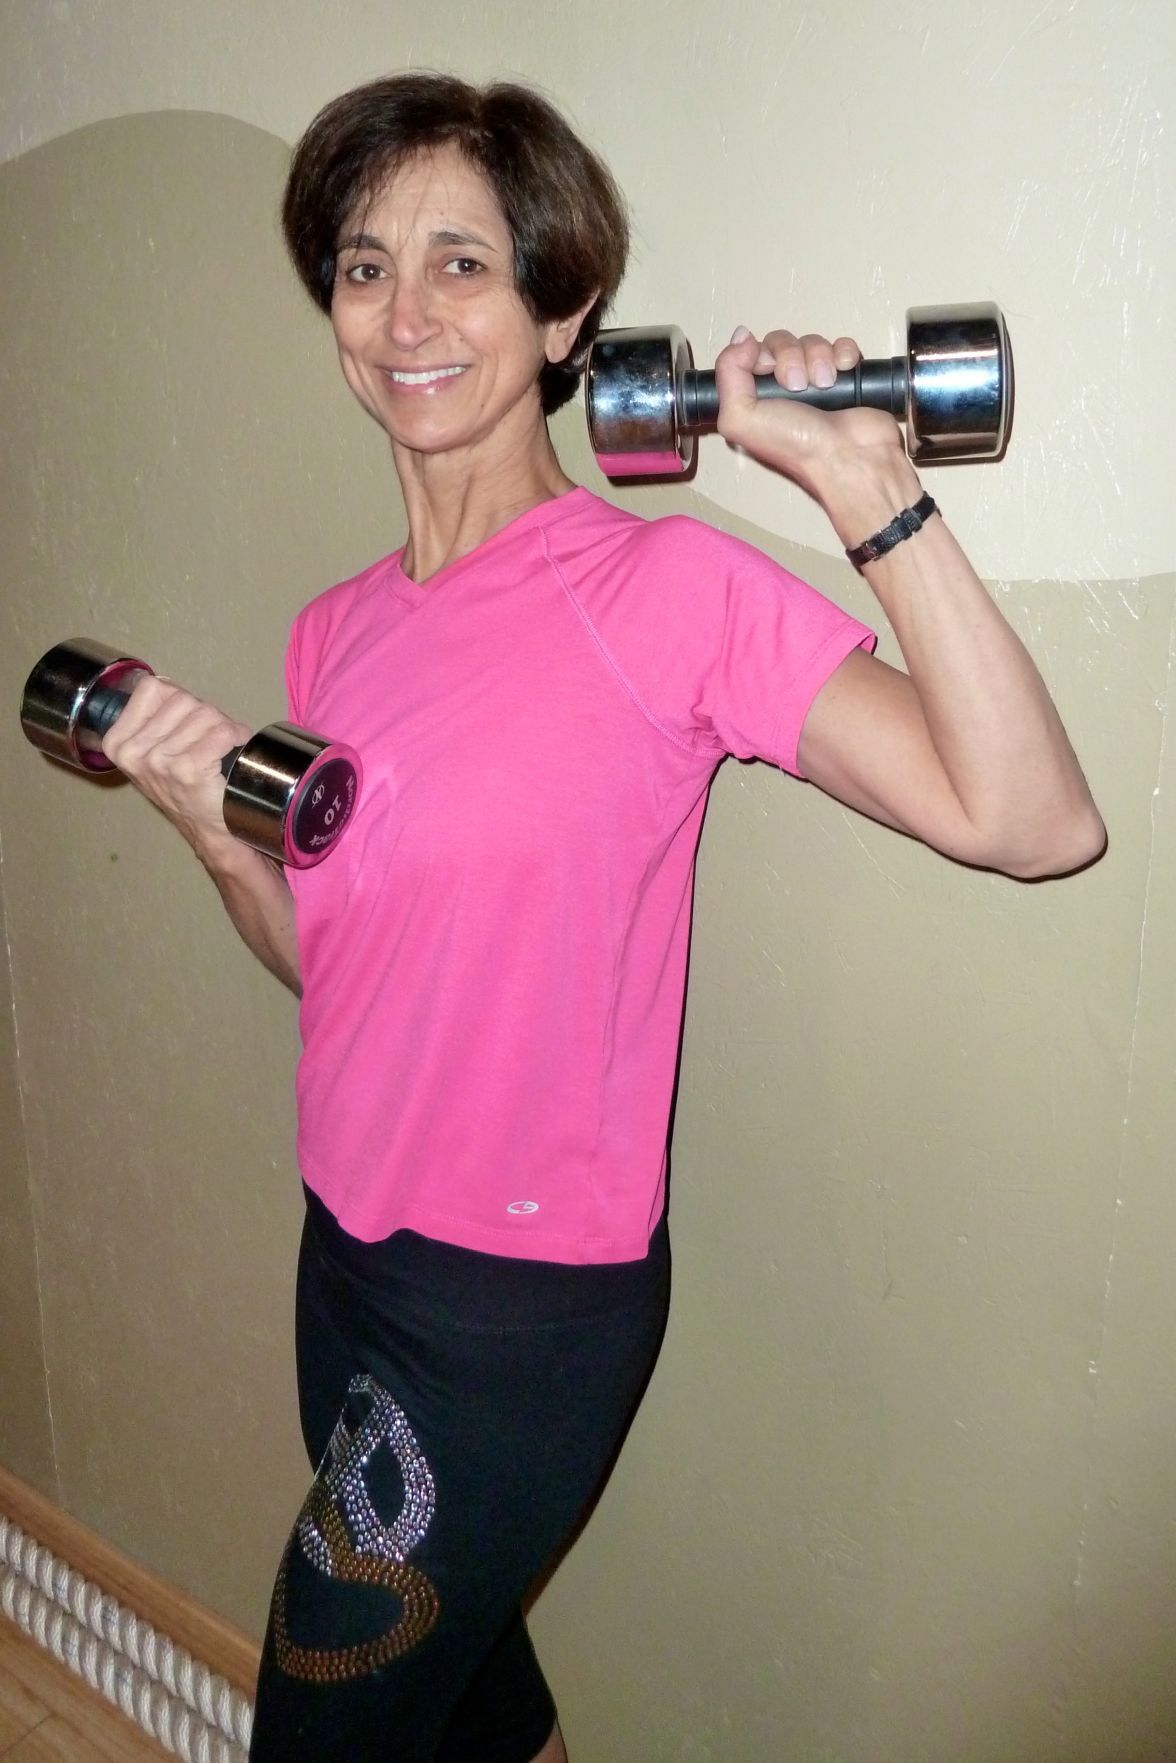 Mary Ann w weights in pink .jpg